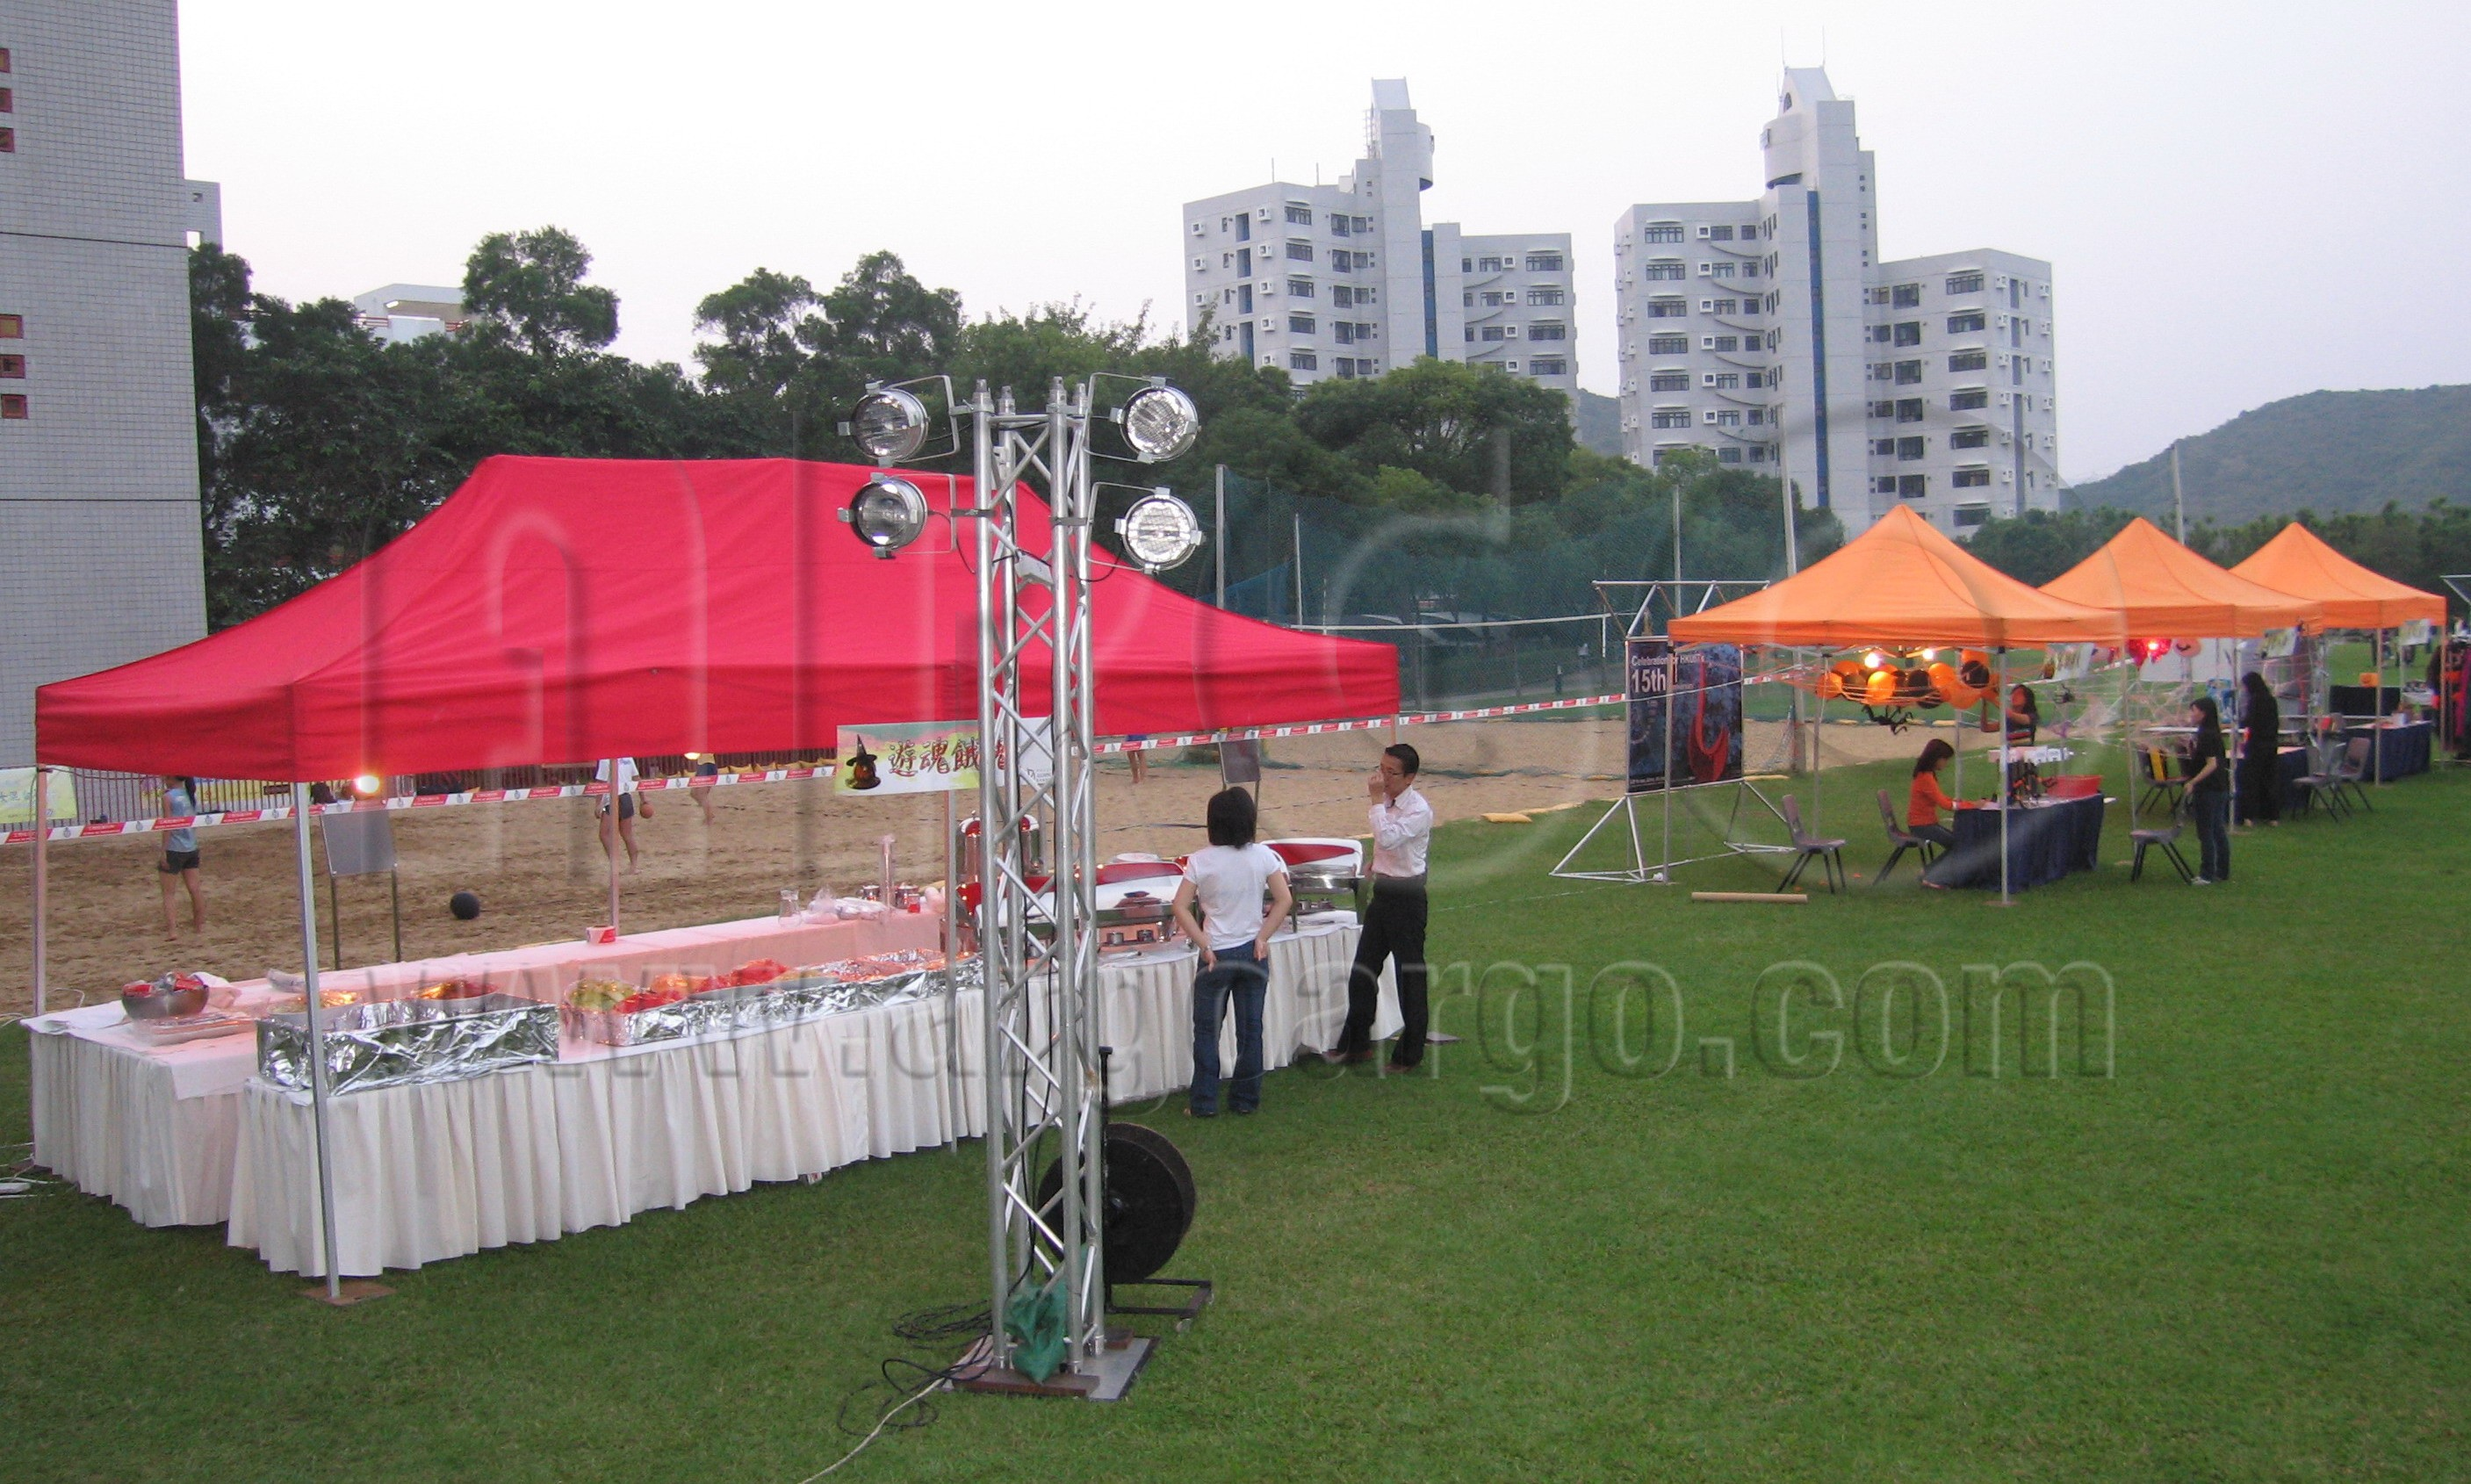 3m X 6m Folding Marquee Booth 藝高製作有限公司